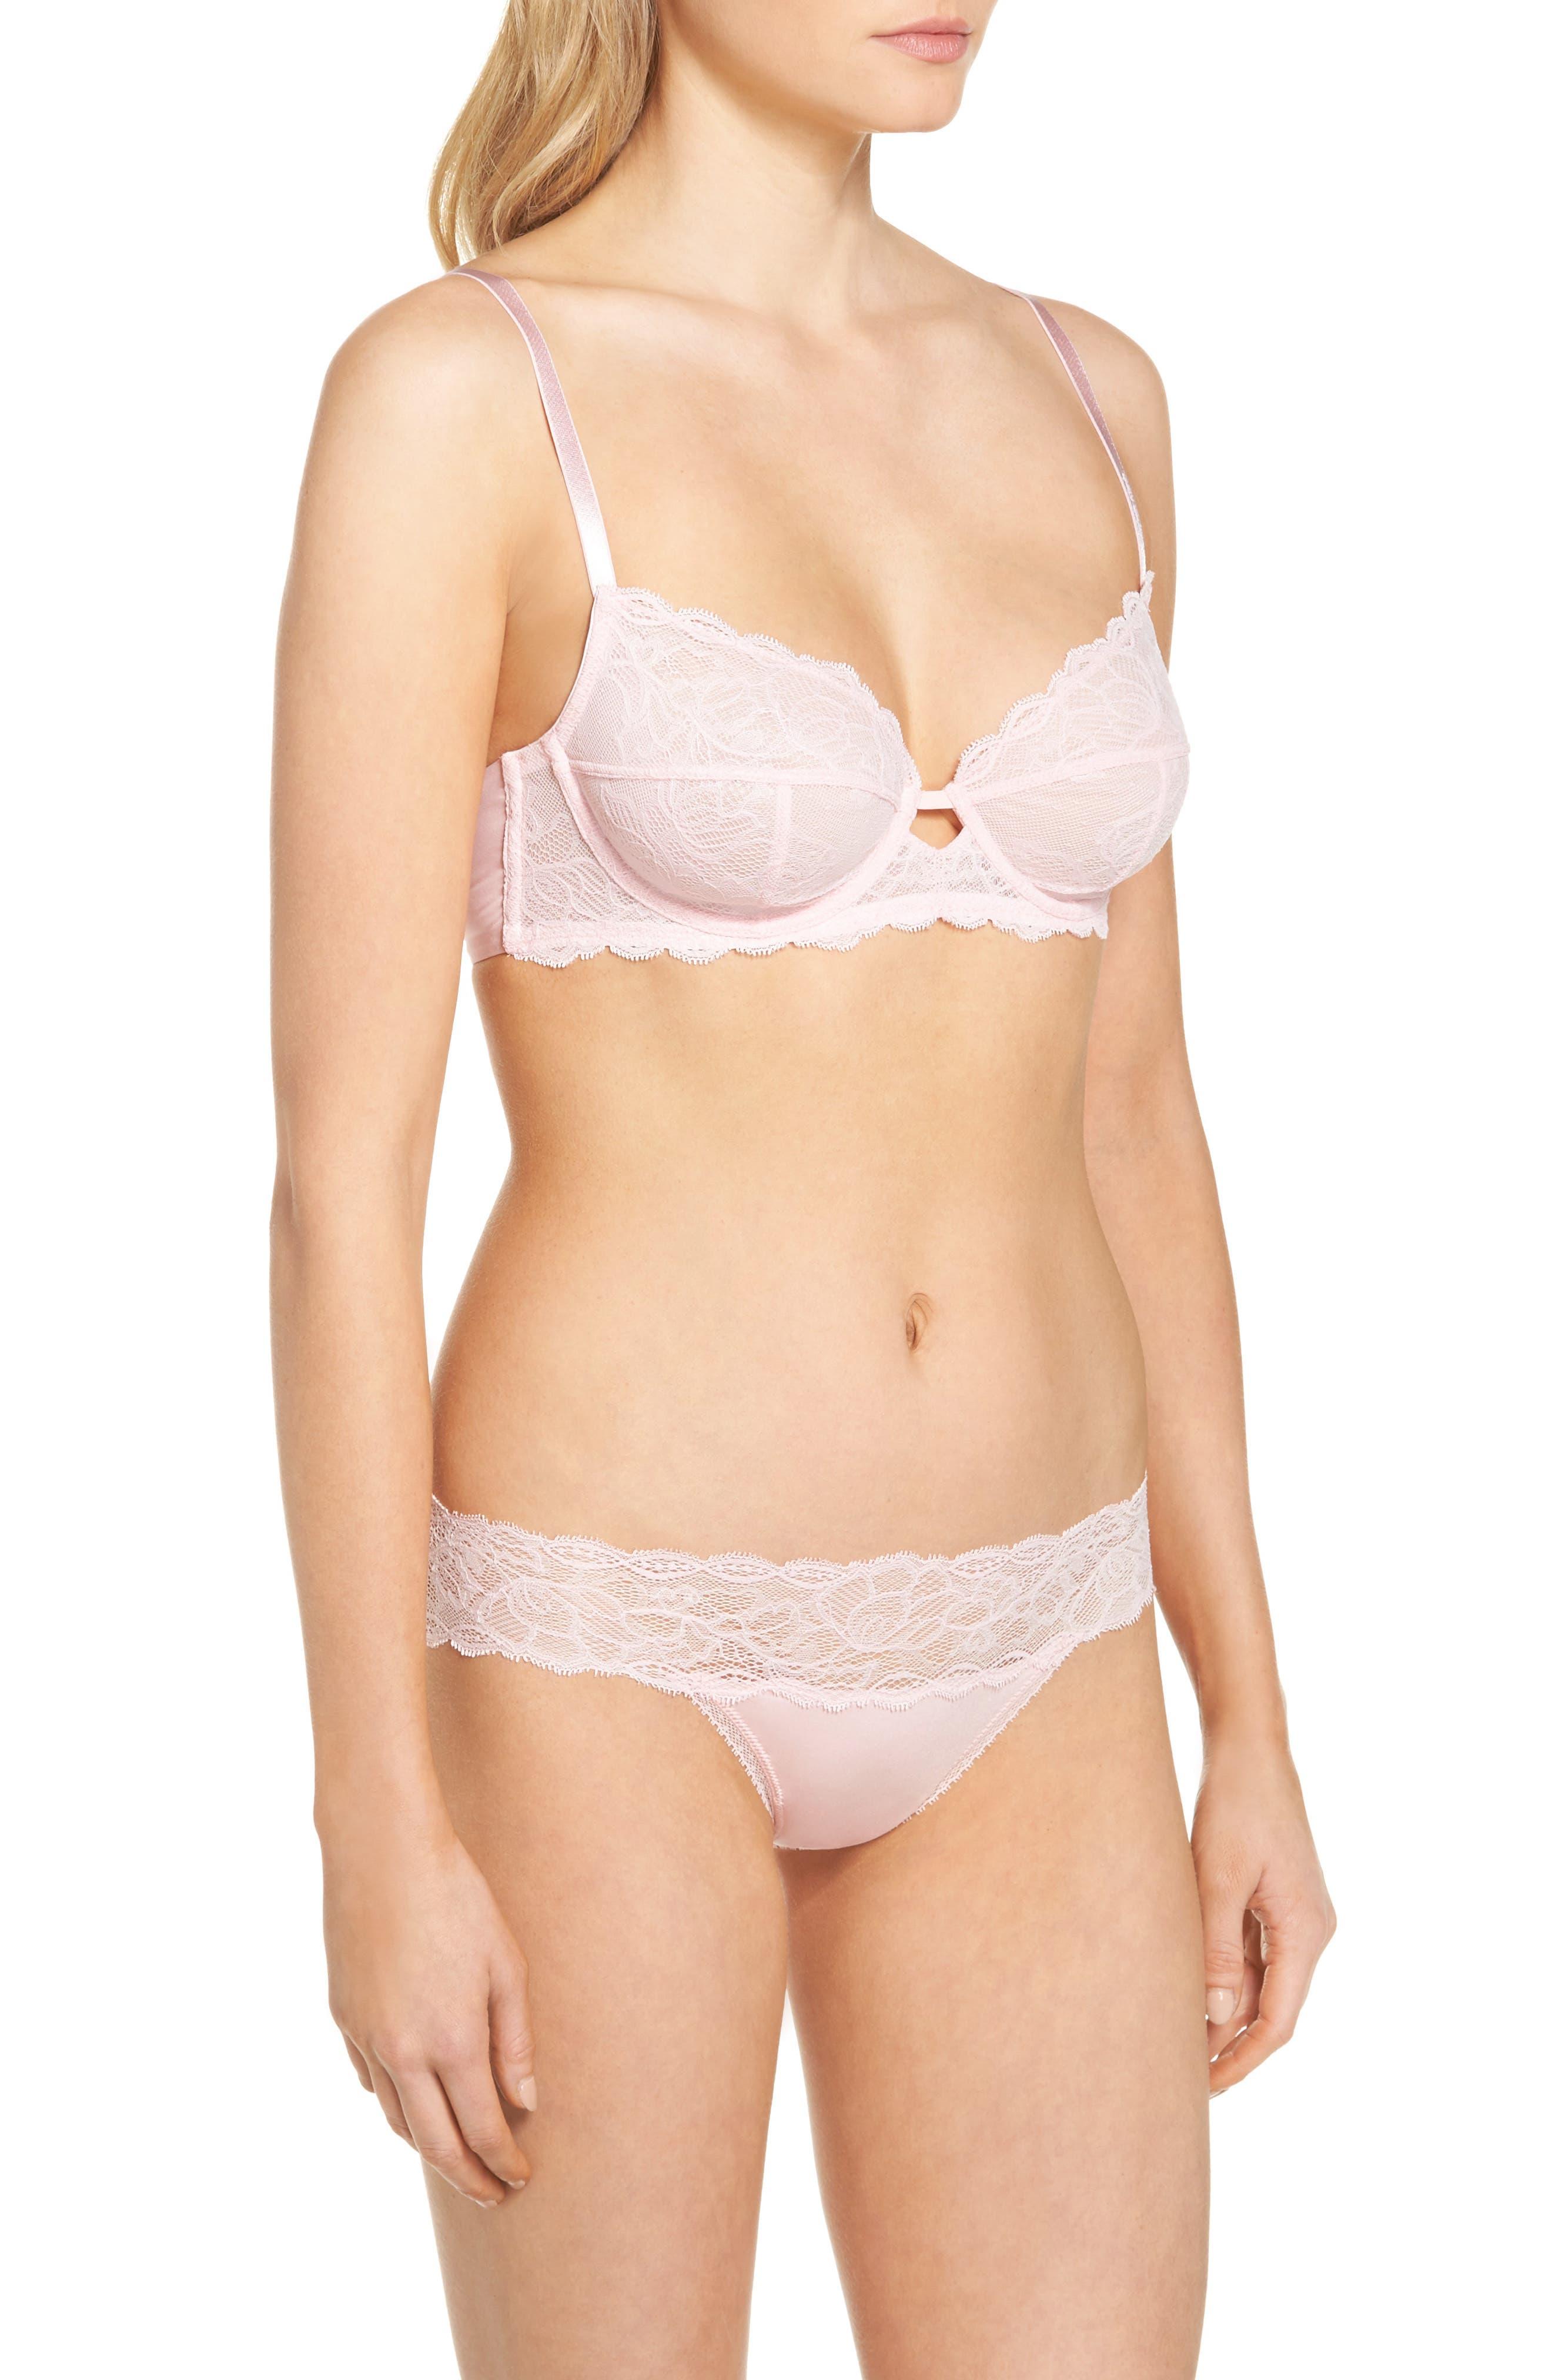 Seductive Comfort Lace Bikini,                             Alternate thumbnail 8, color,                             Attract